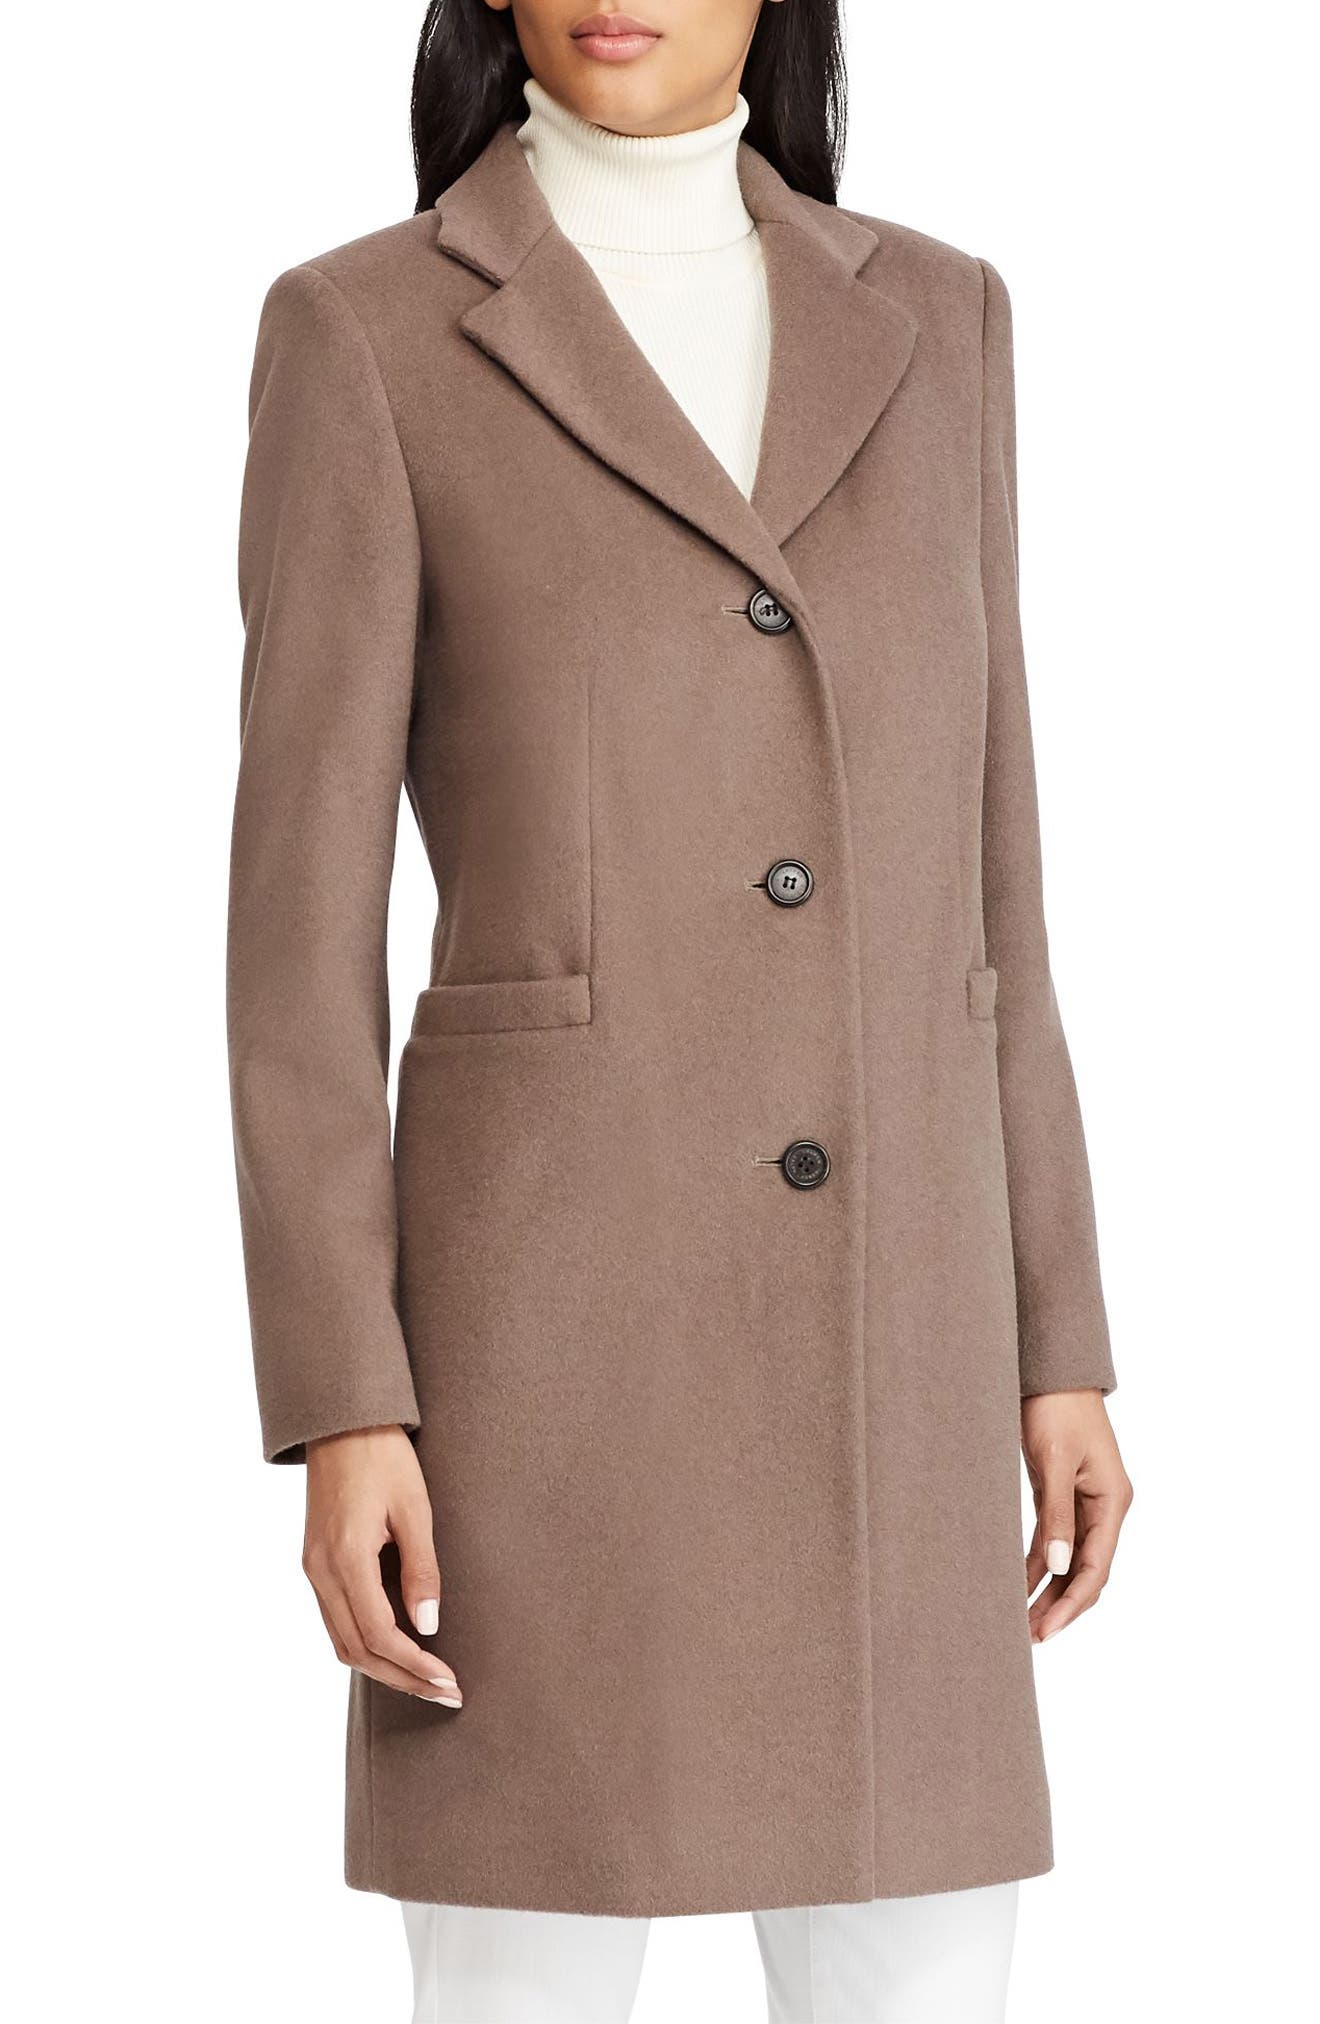 Paige Wool Blend Reefer Coat,                         Main,                         color, Pebble